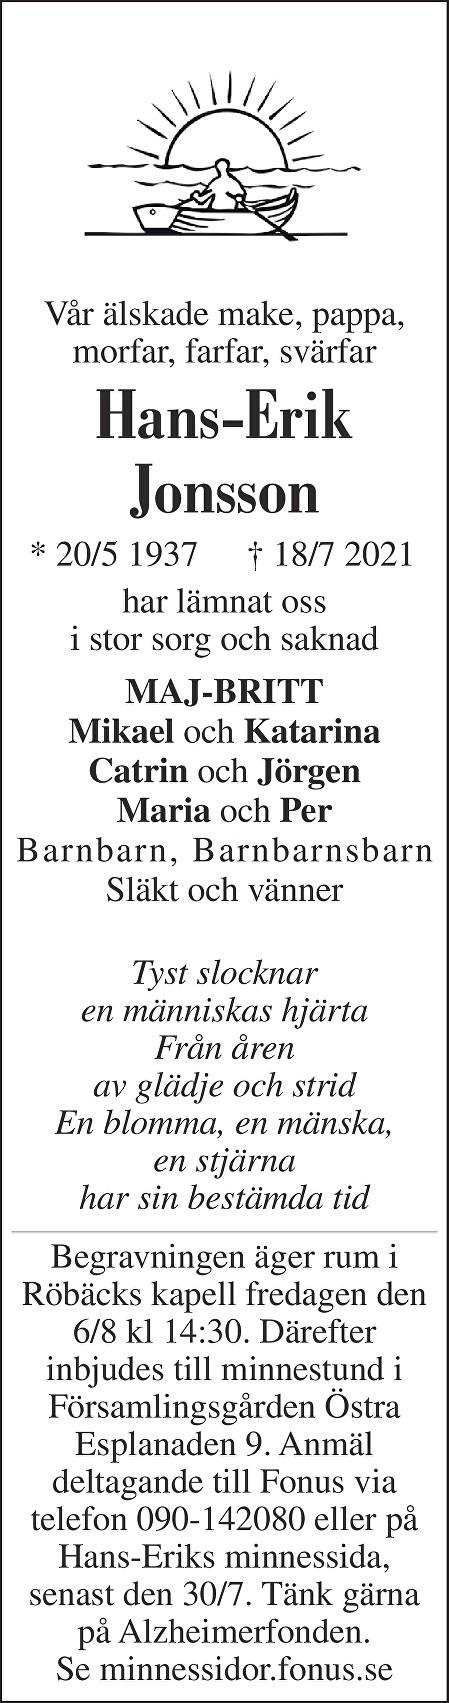 Hans-Erik Jonsson Death notice